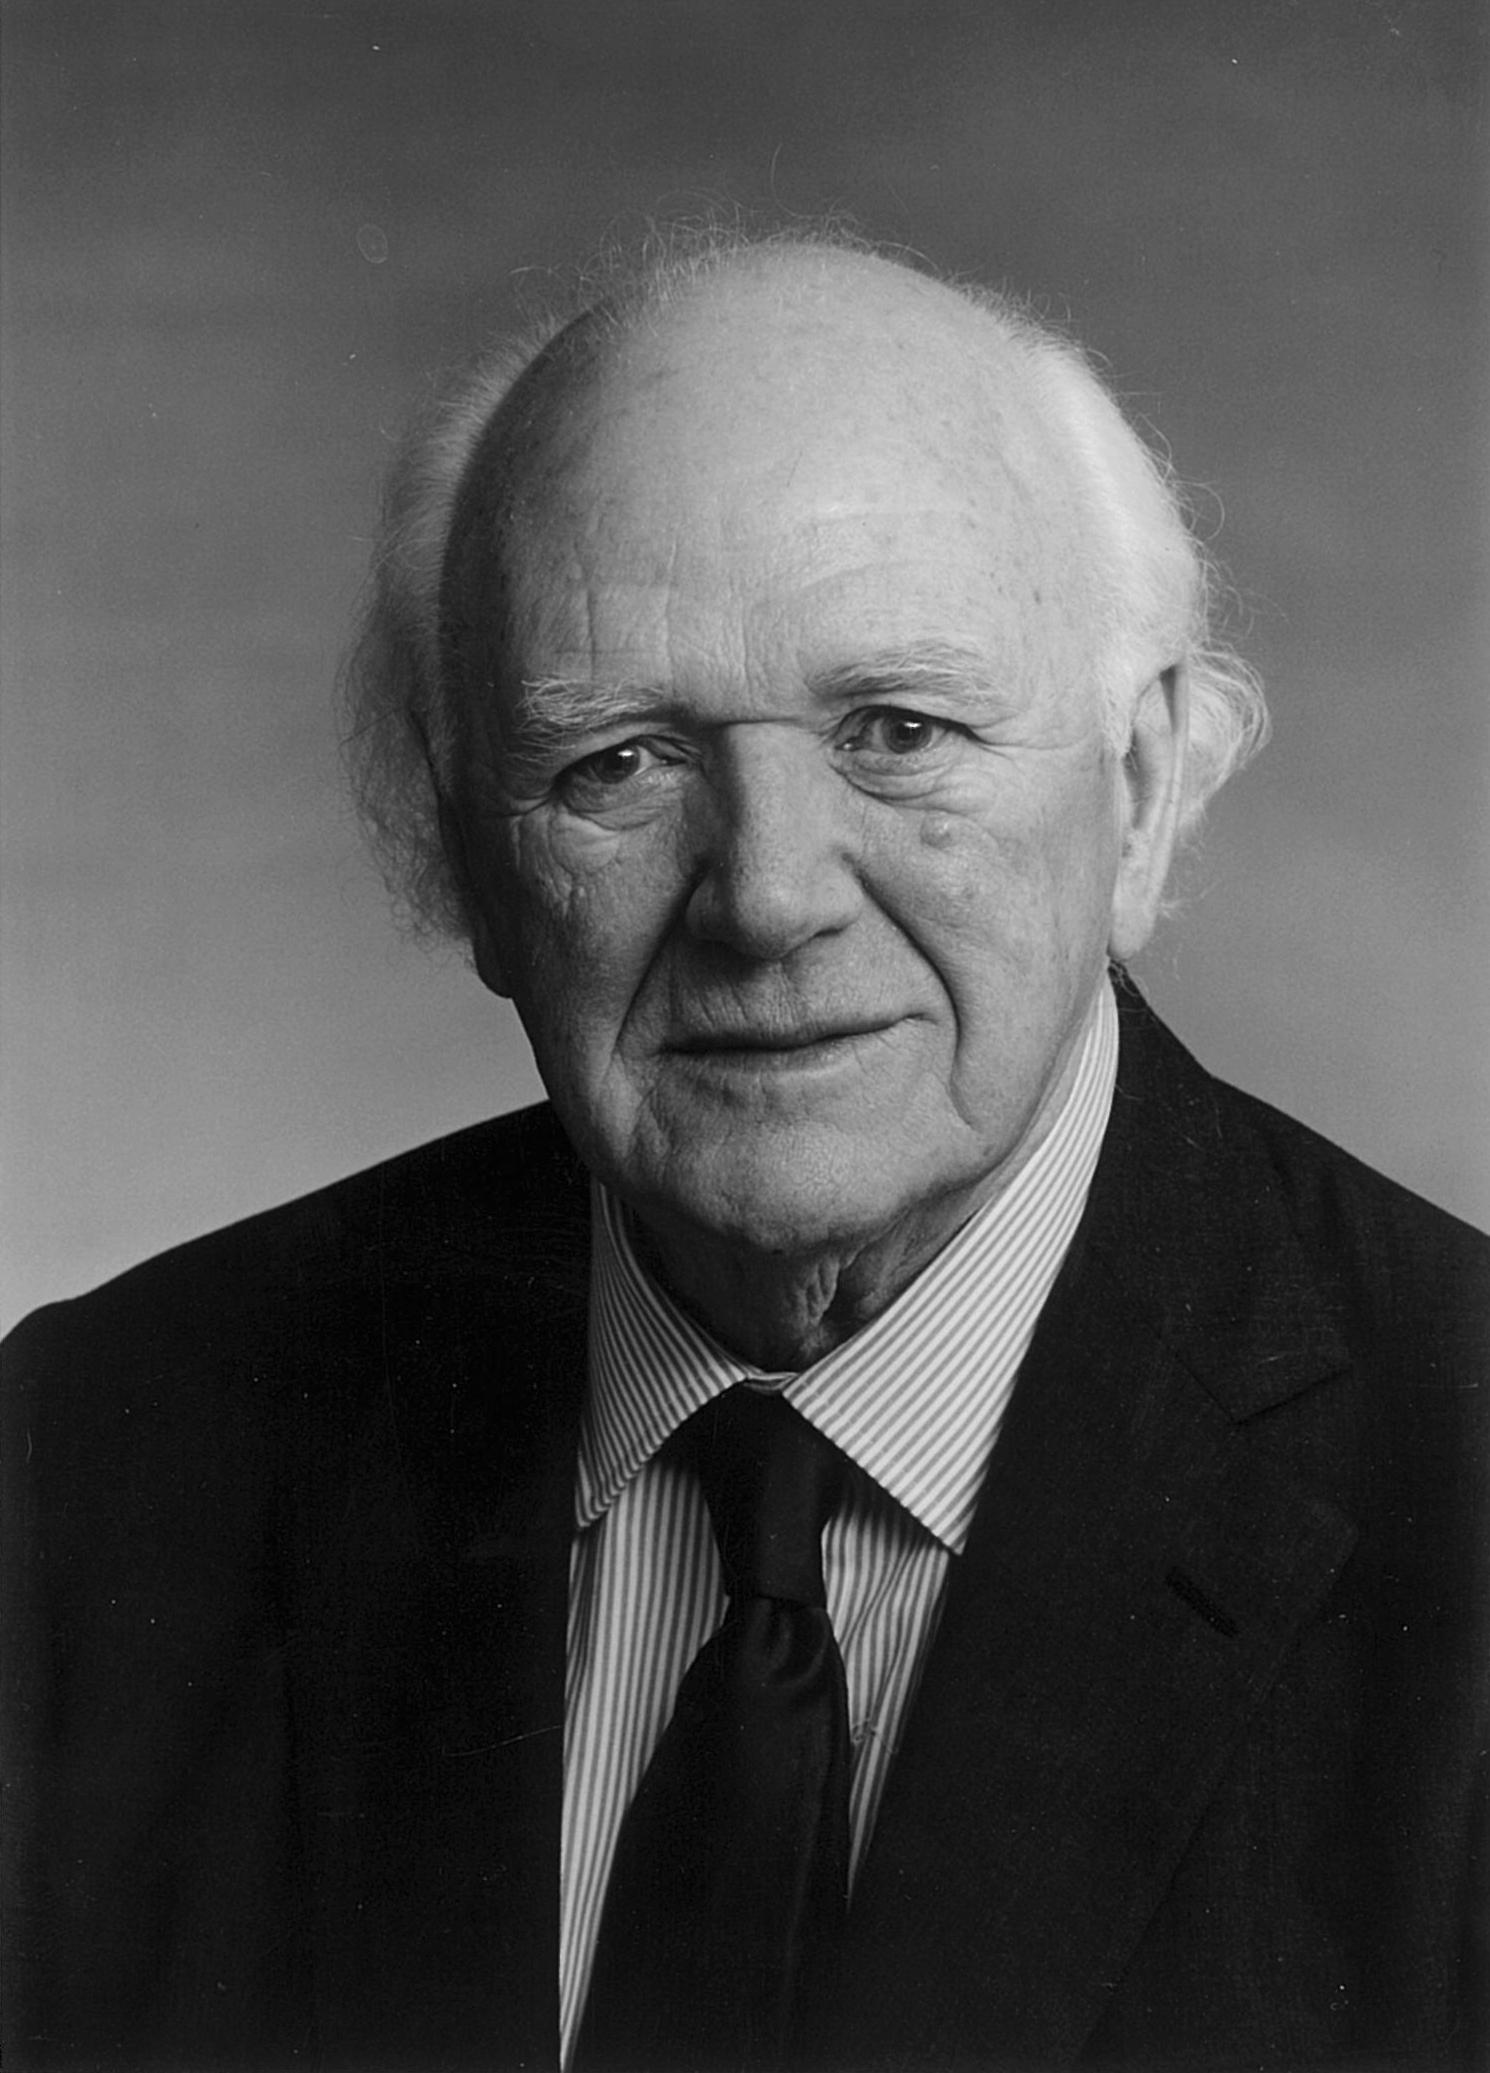 Frederick H. Burkhardt